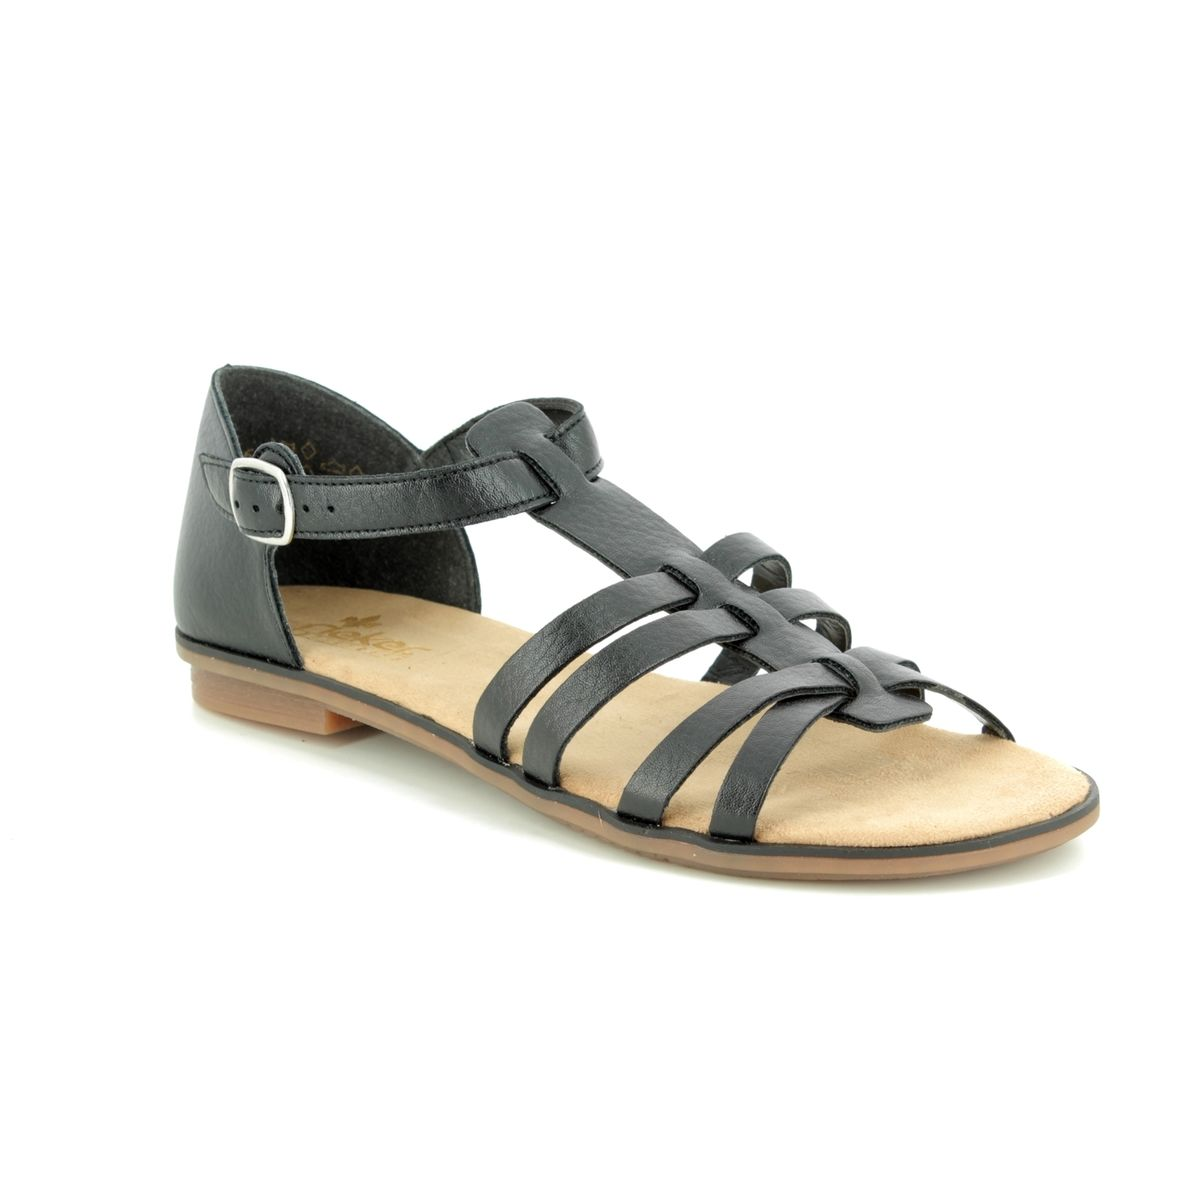 Rieker Flat Sandals - Black - 64288-01 YORBACK